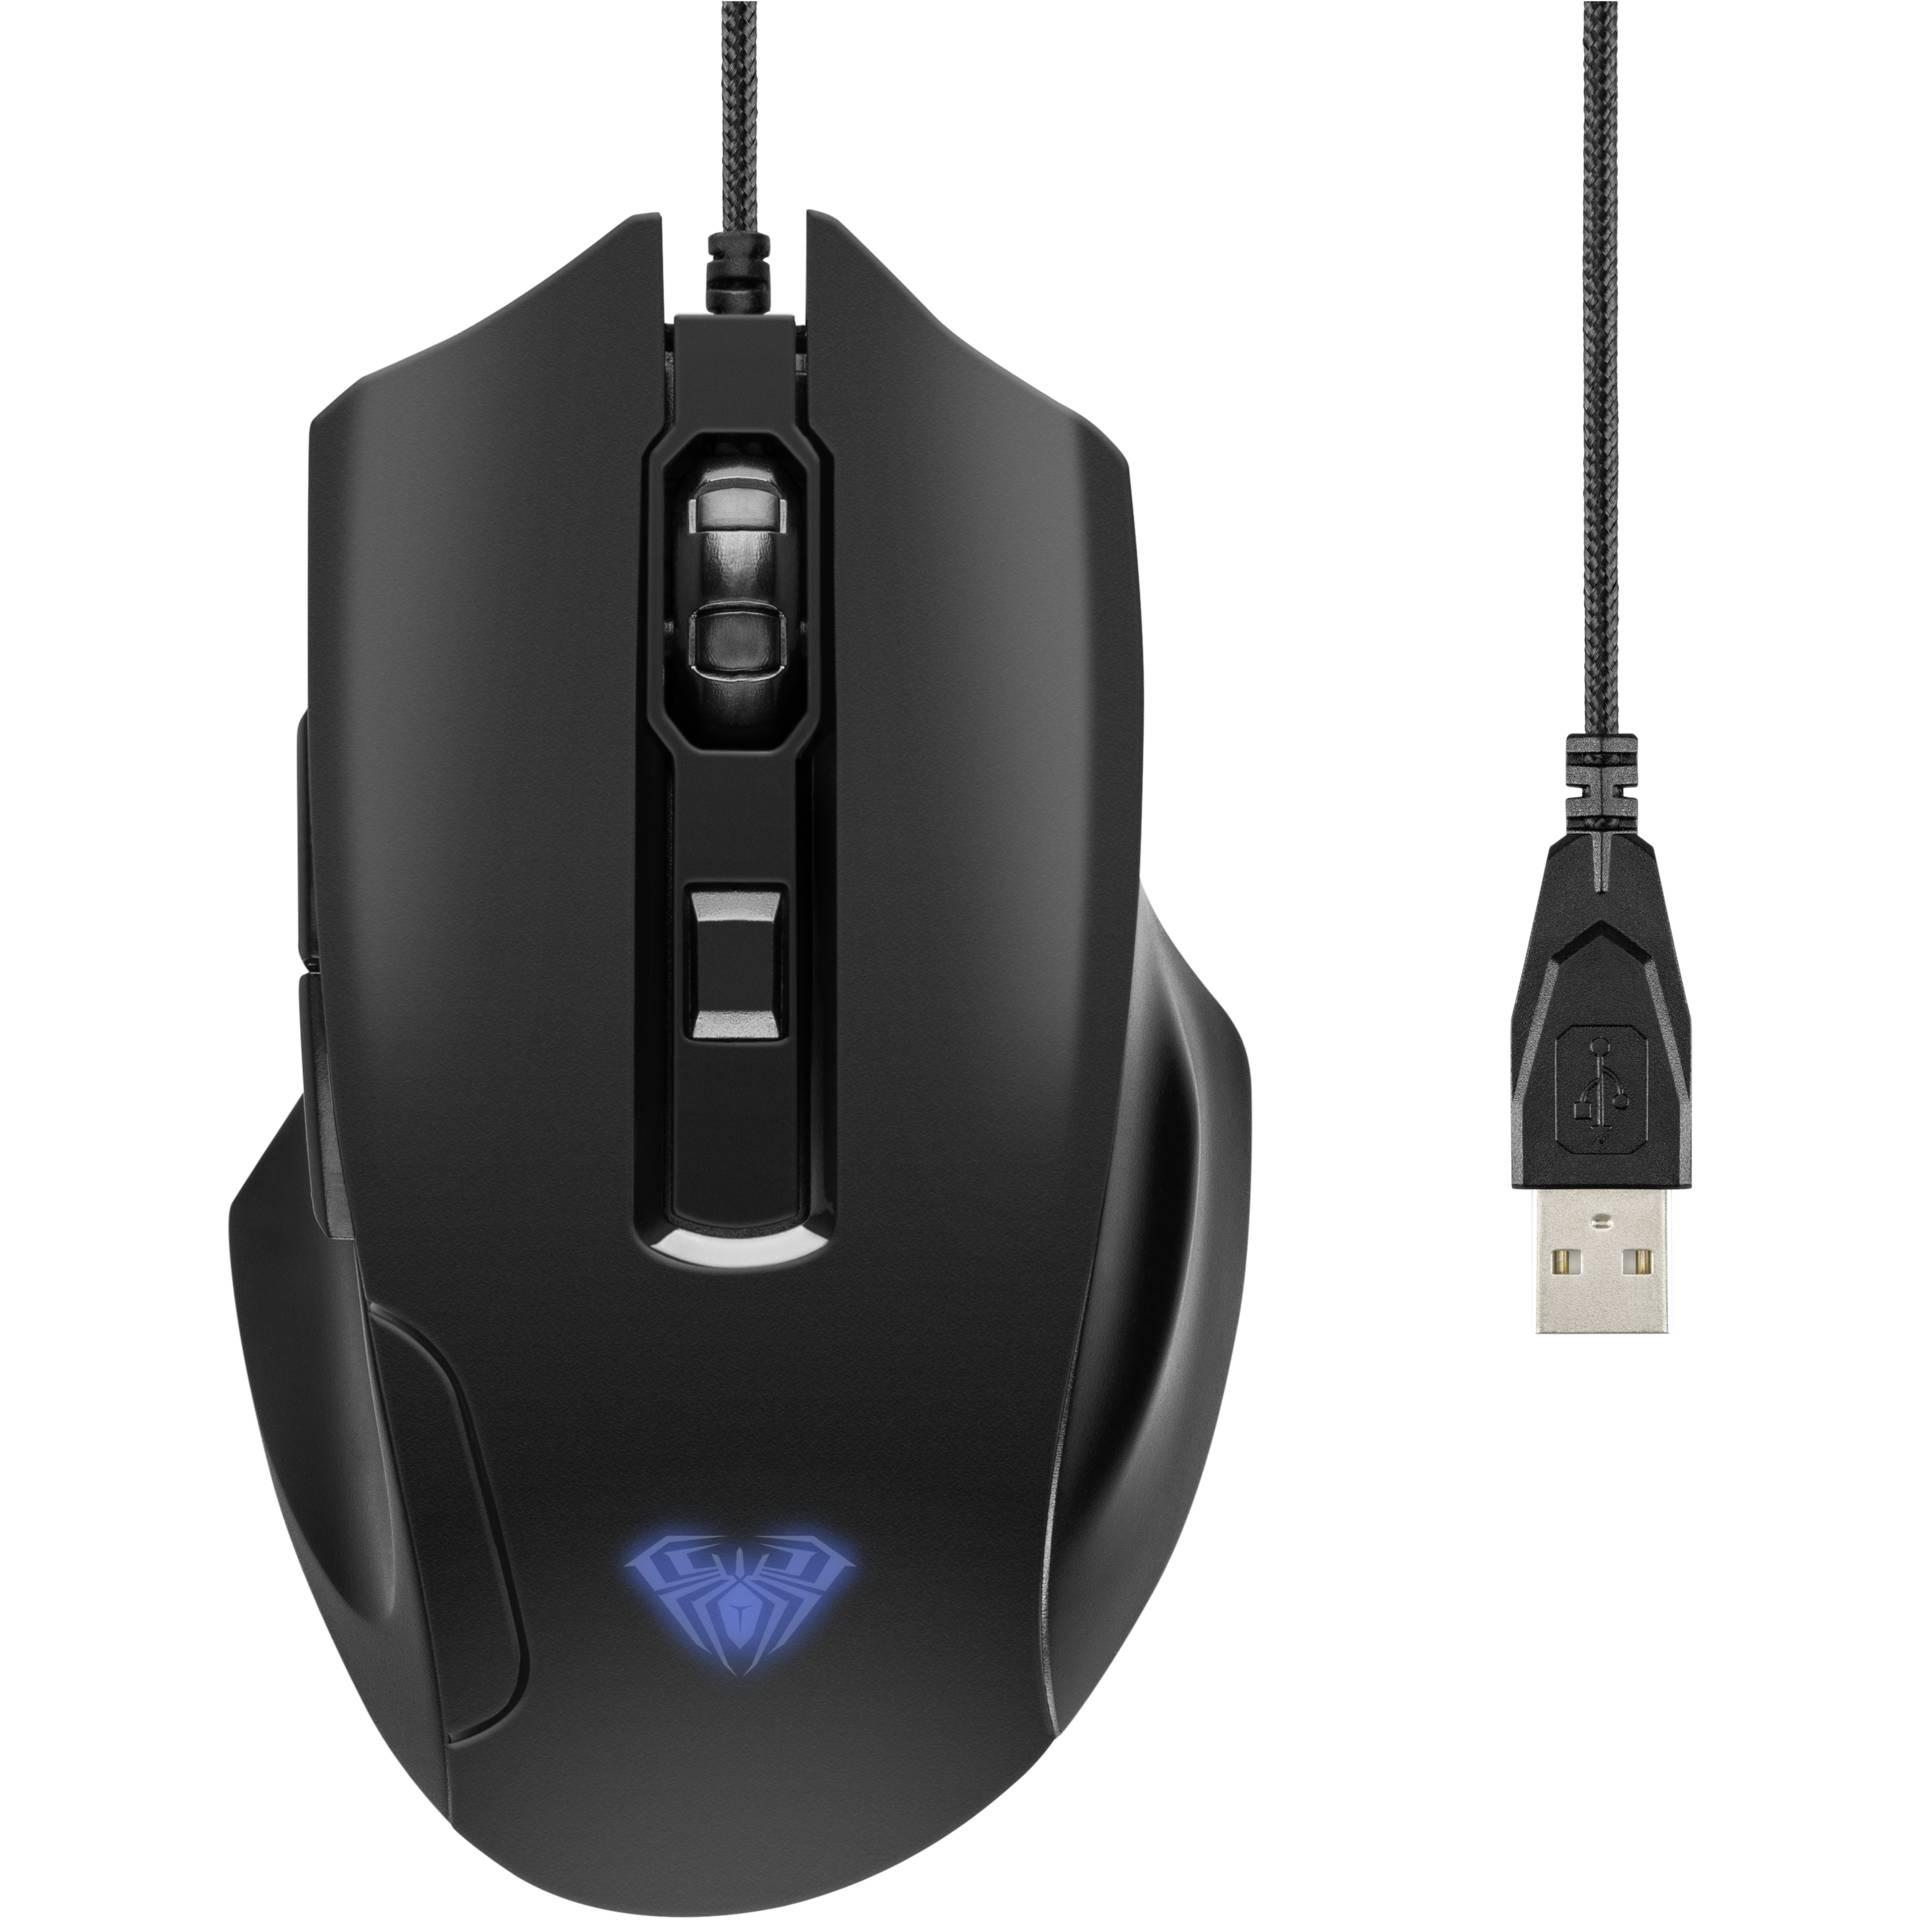 Aula Interia Gaming Mouse